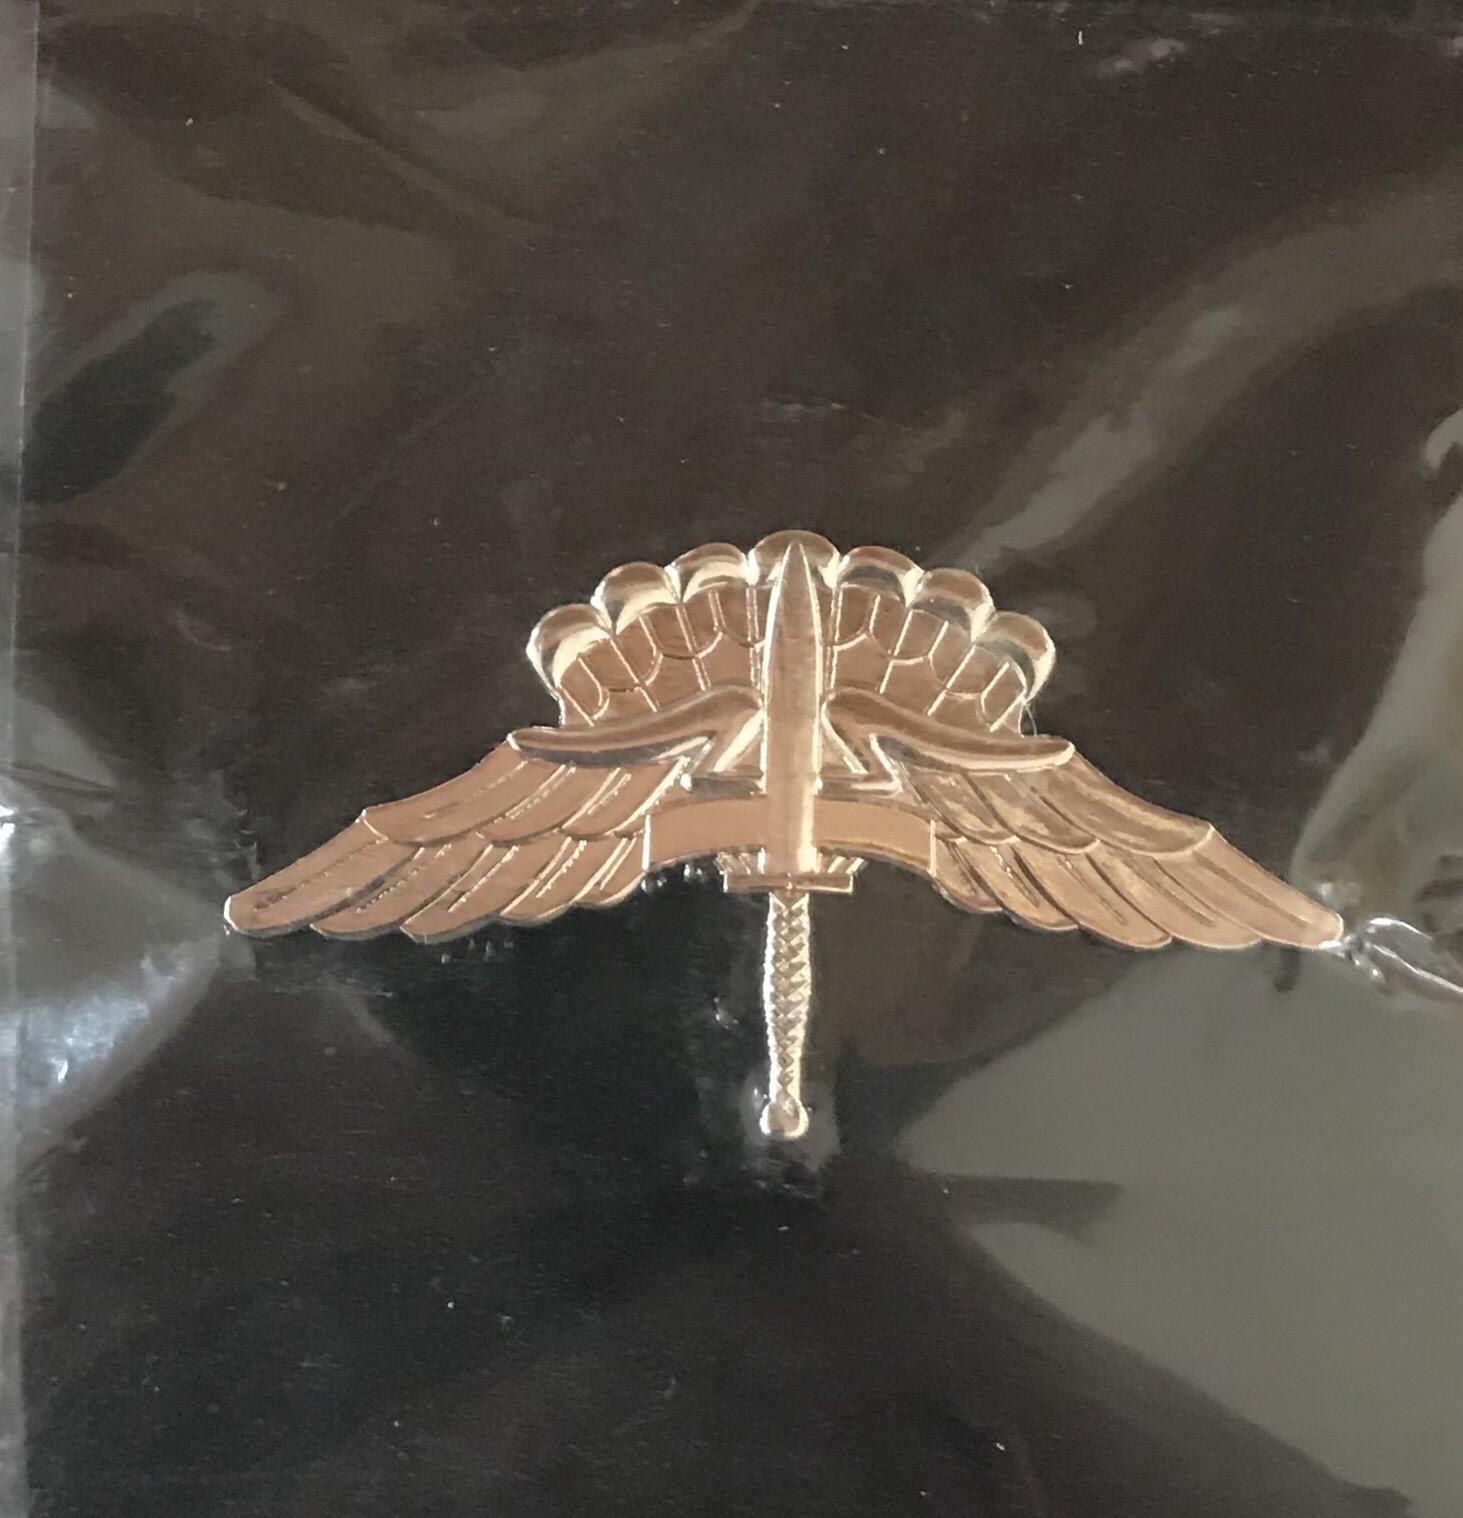 bdg/ Freefall Jump Wings - Mirror Finish (Regulation size) 04-0008